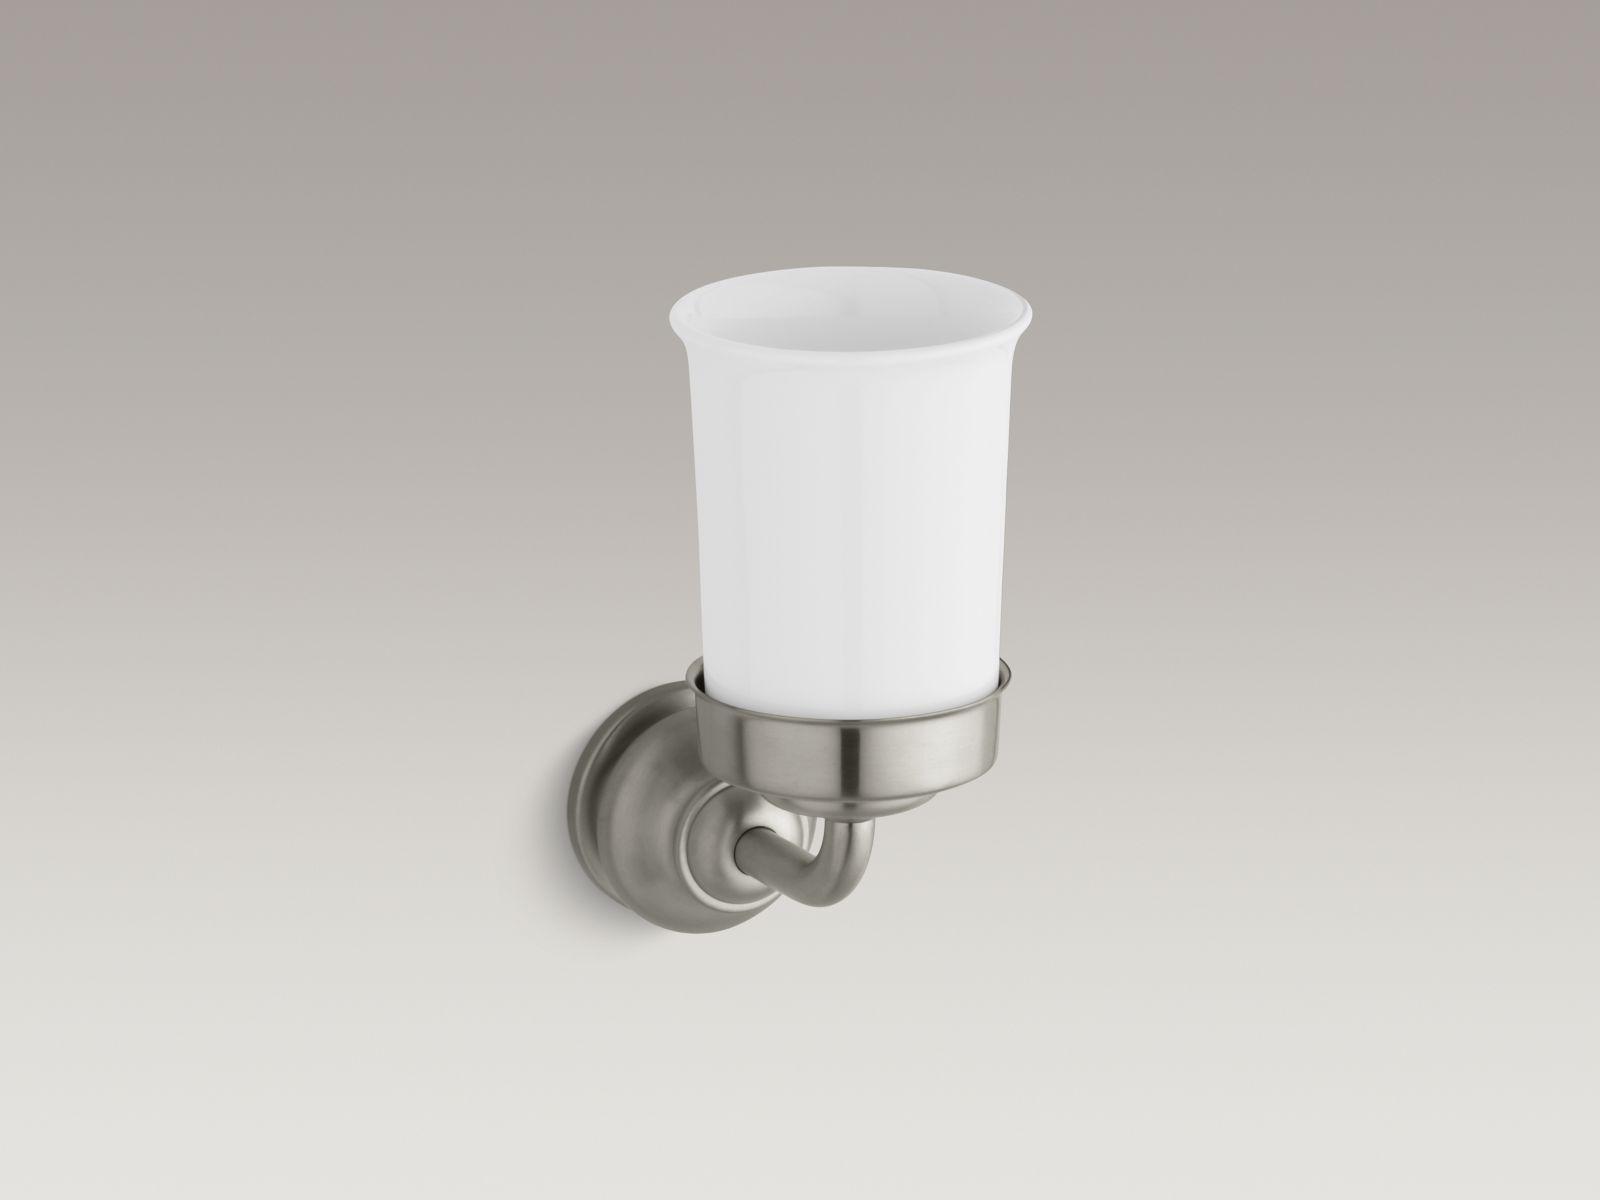 BuyPlumbing.net - Product: Kohler K-12161-BN Fairfax Tumbler and ...